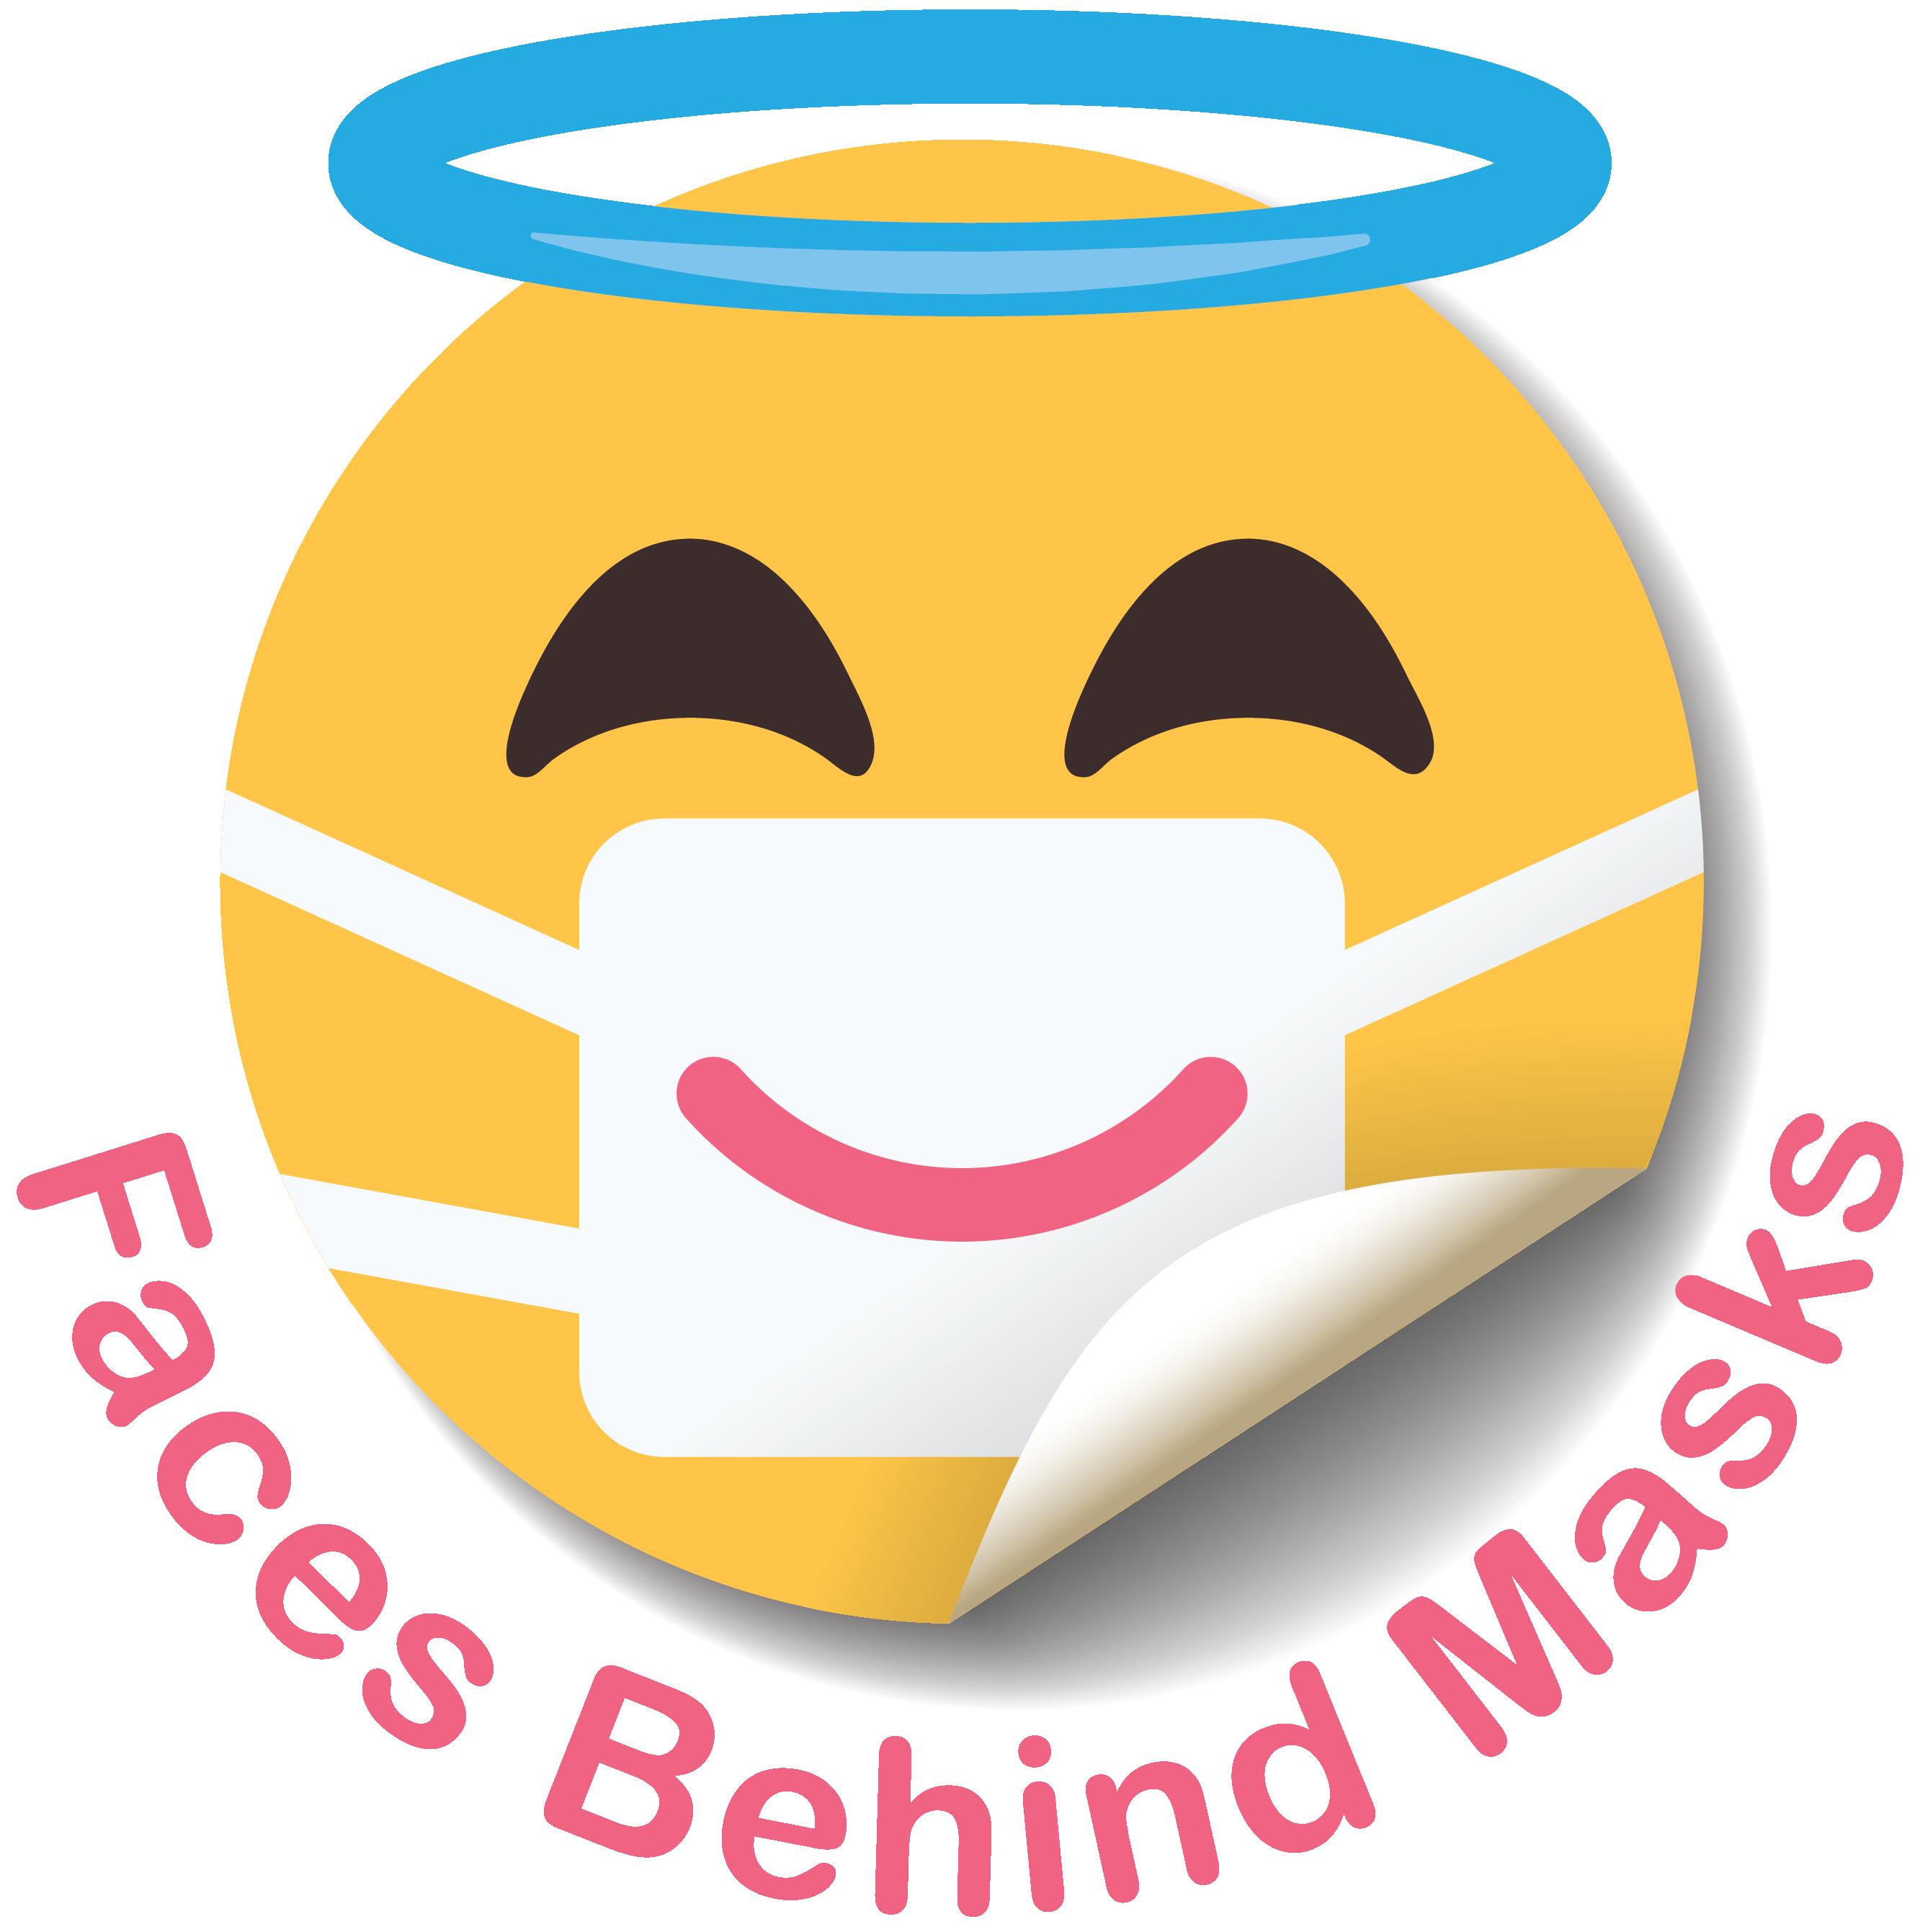 Faces Behind Masks logo